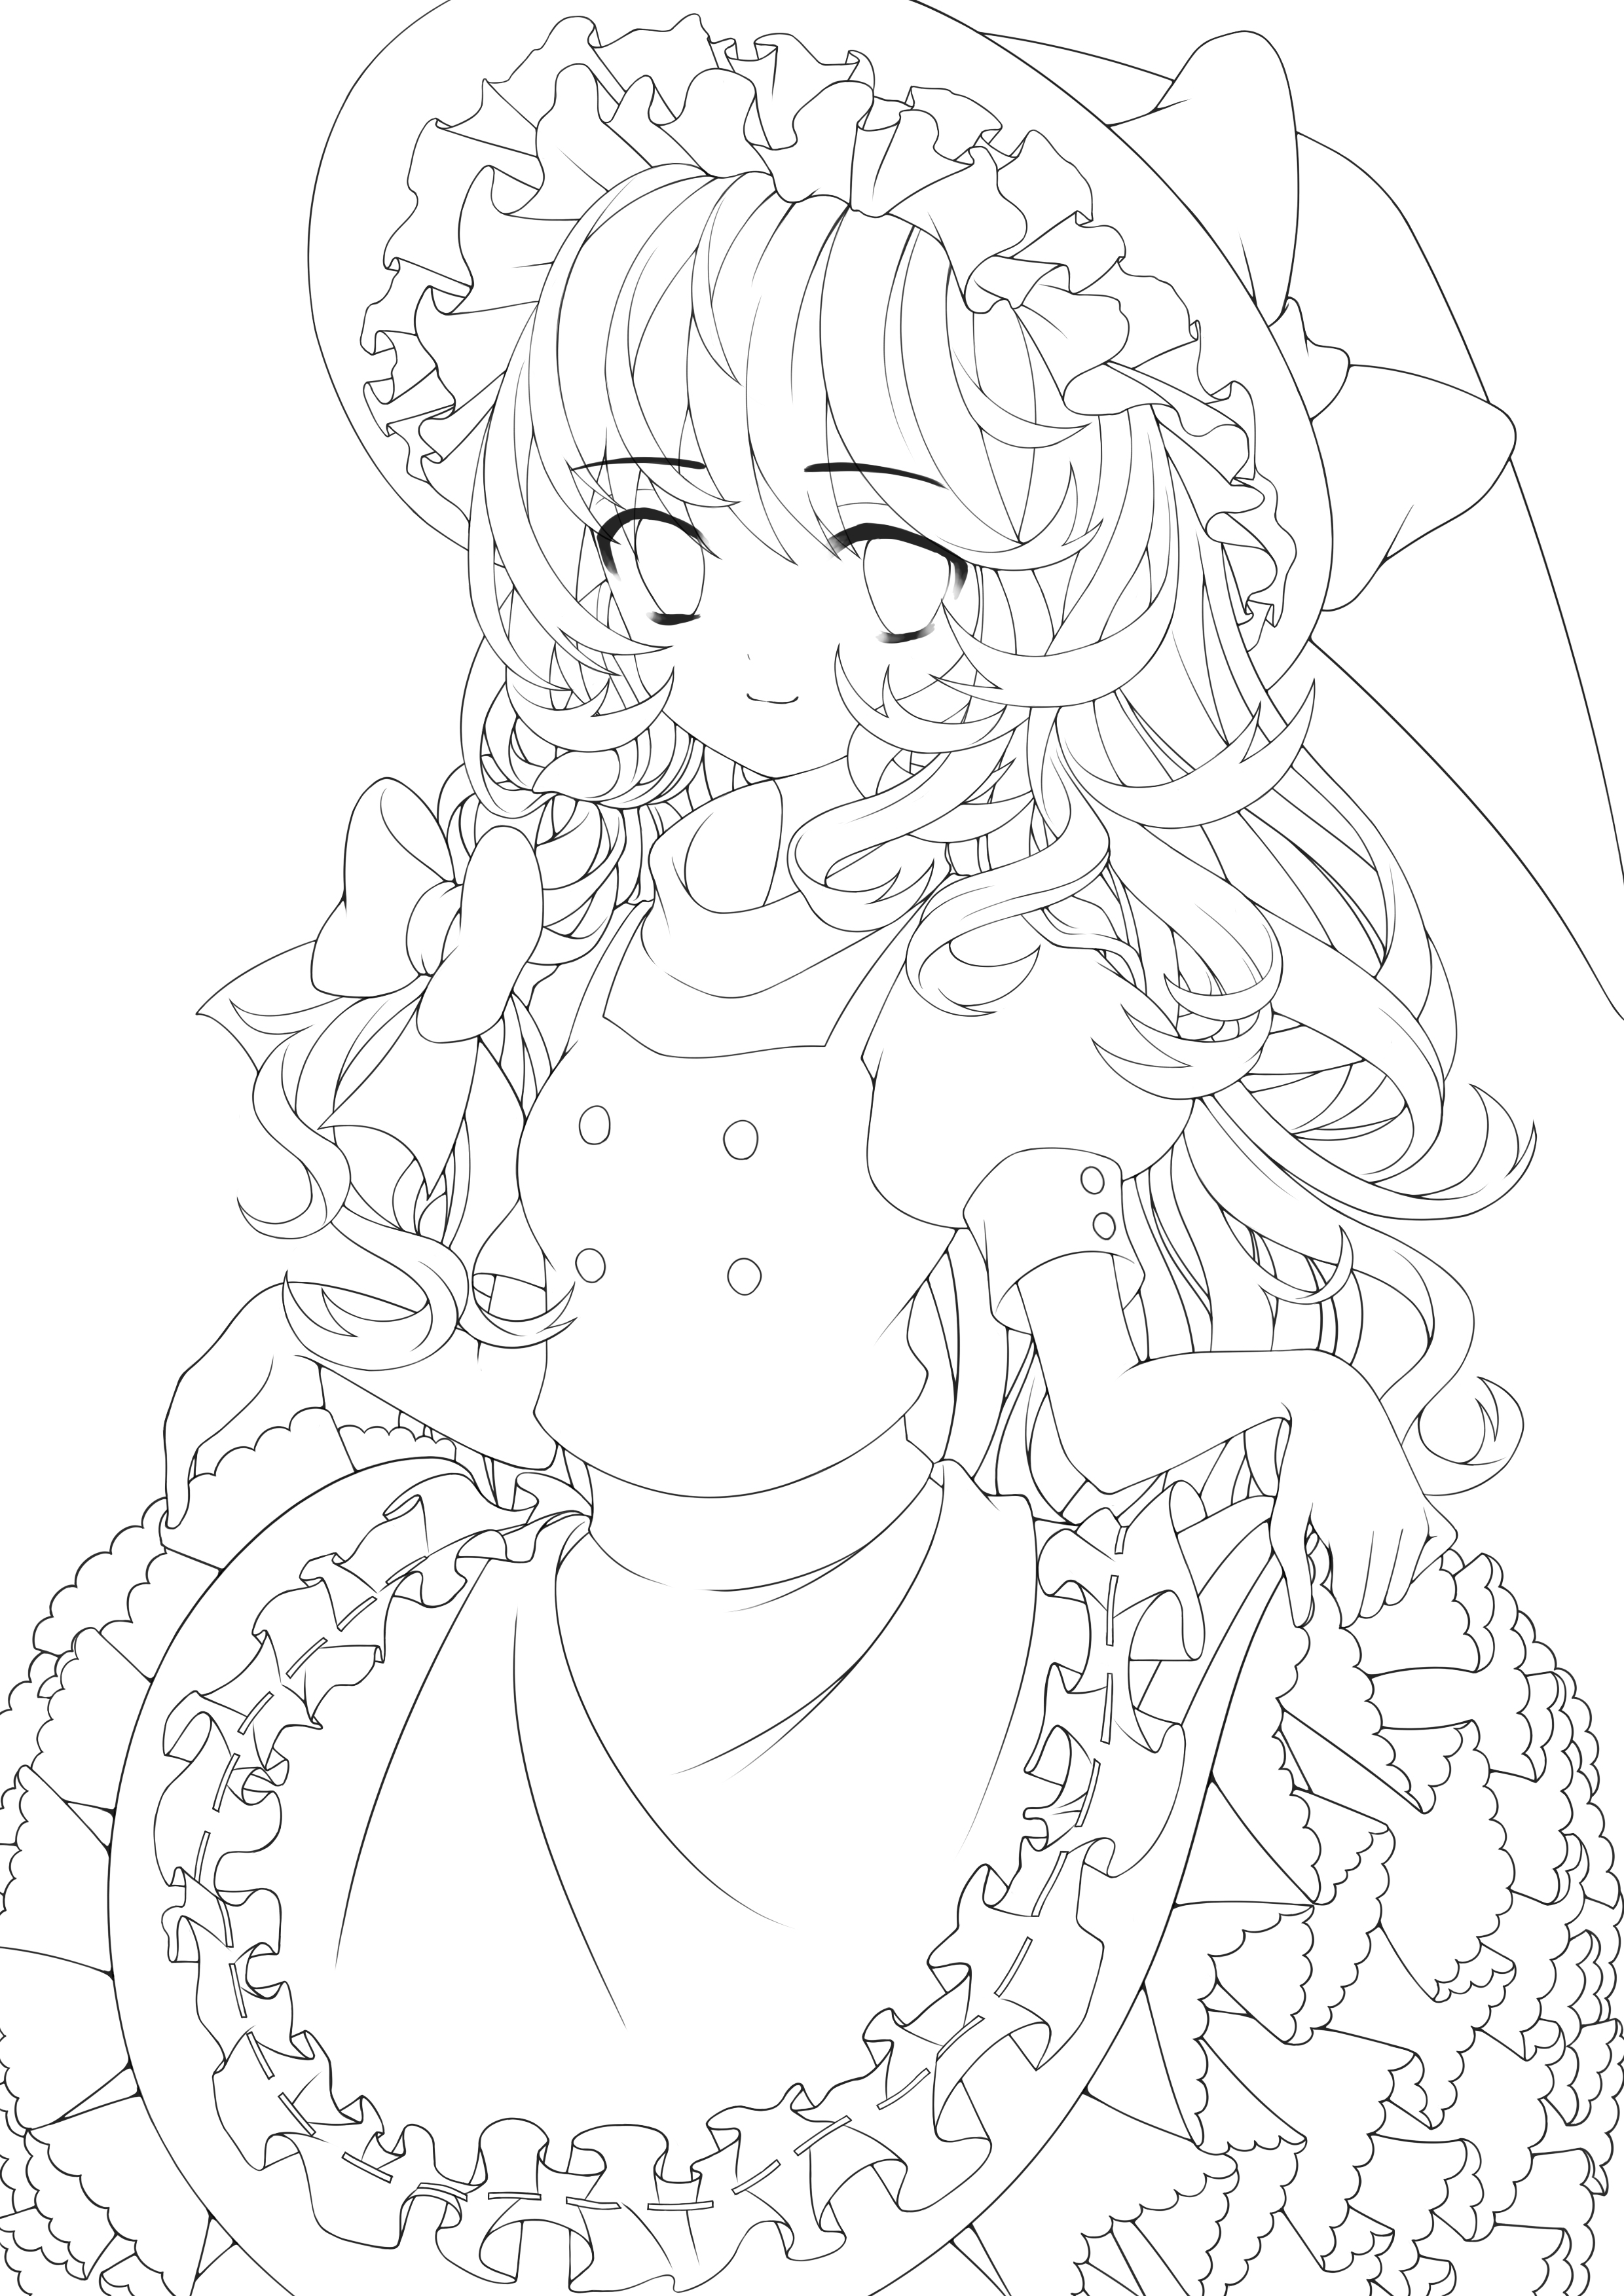 Zerochan Lineart : Kirisame marisa image zerochan anime board